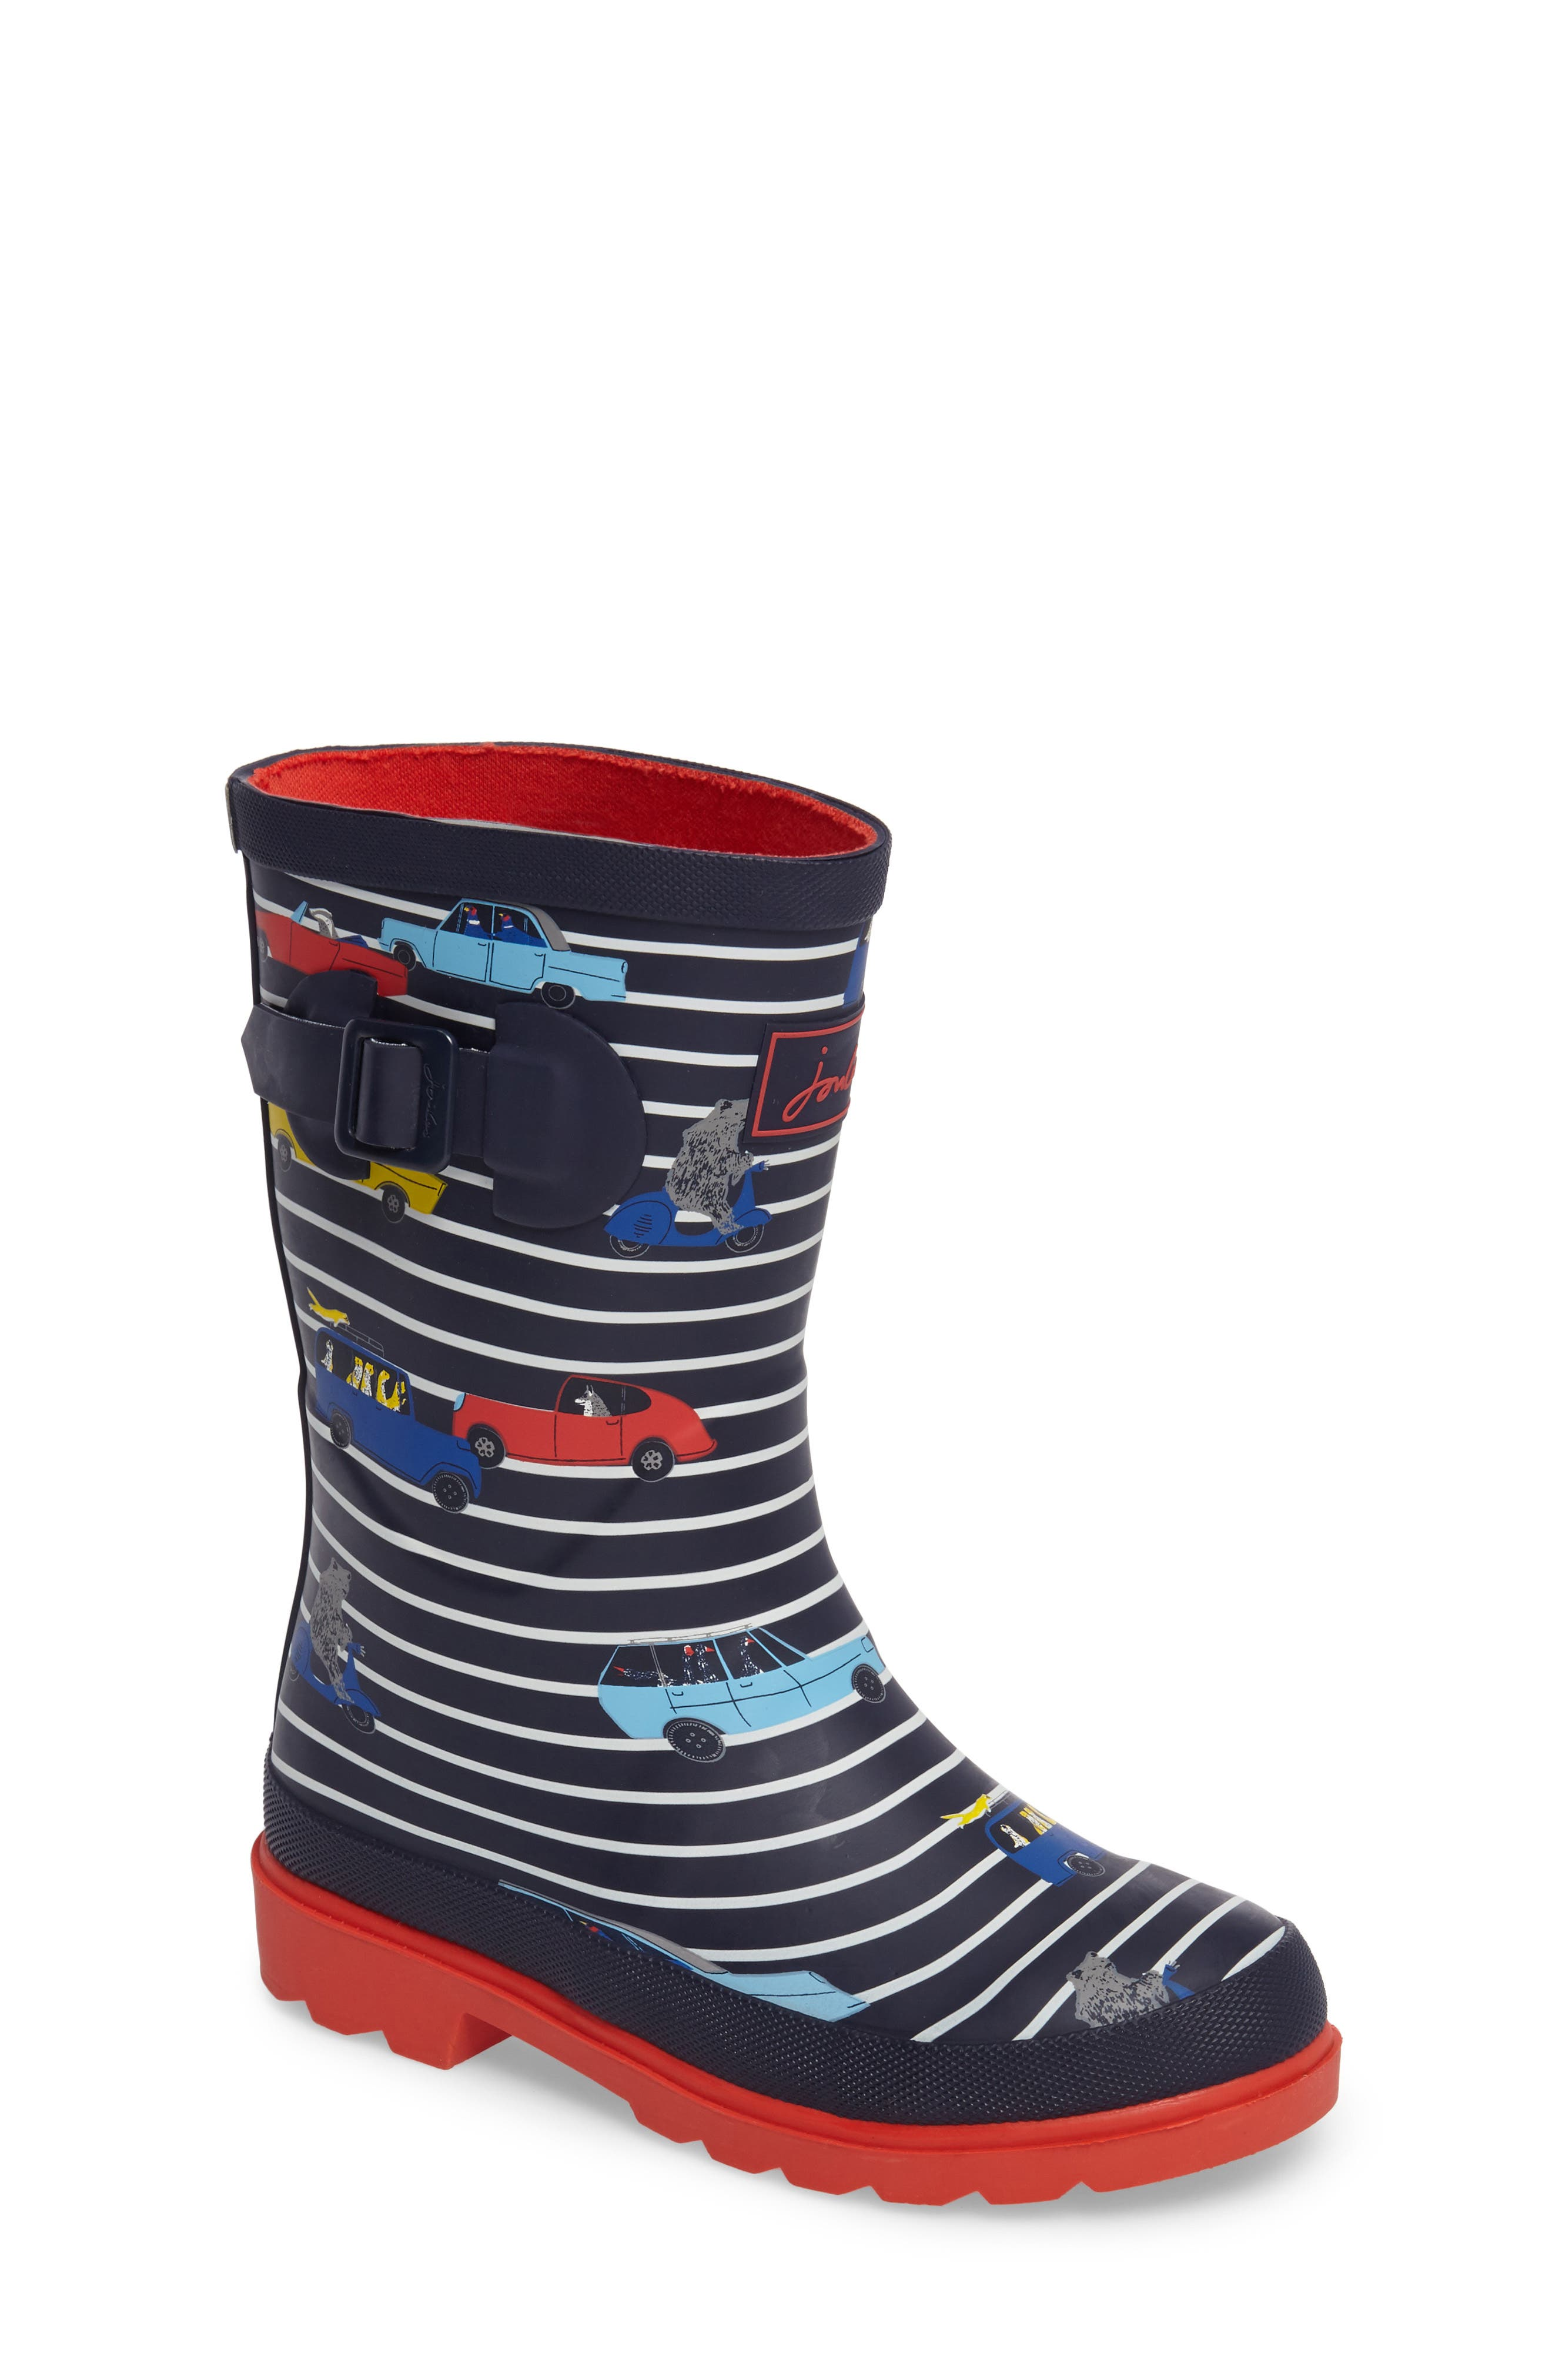 Printed Waterproof Rain Boot,                             Main thumbnail 1, color,                             Navy Stripe Cars